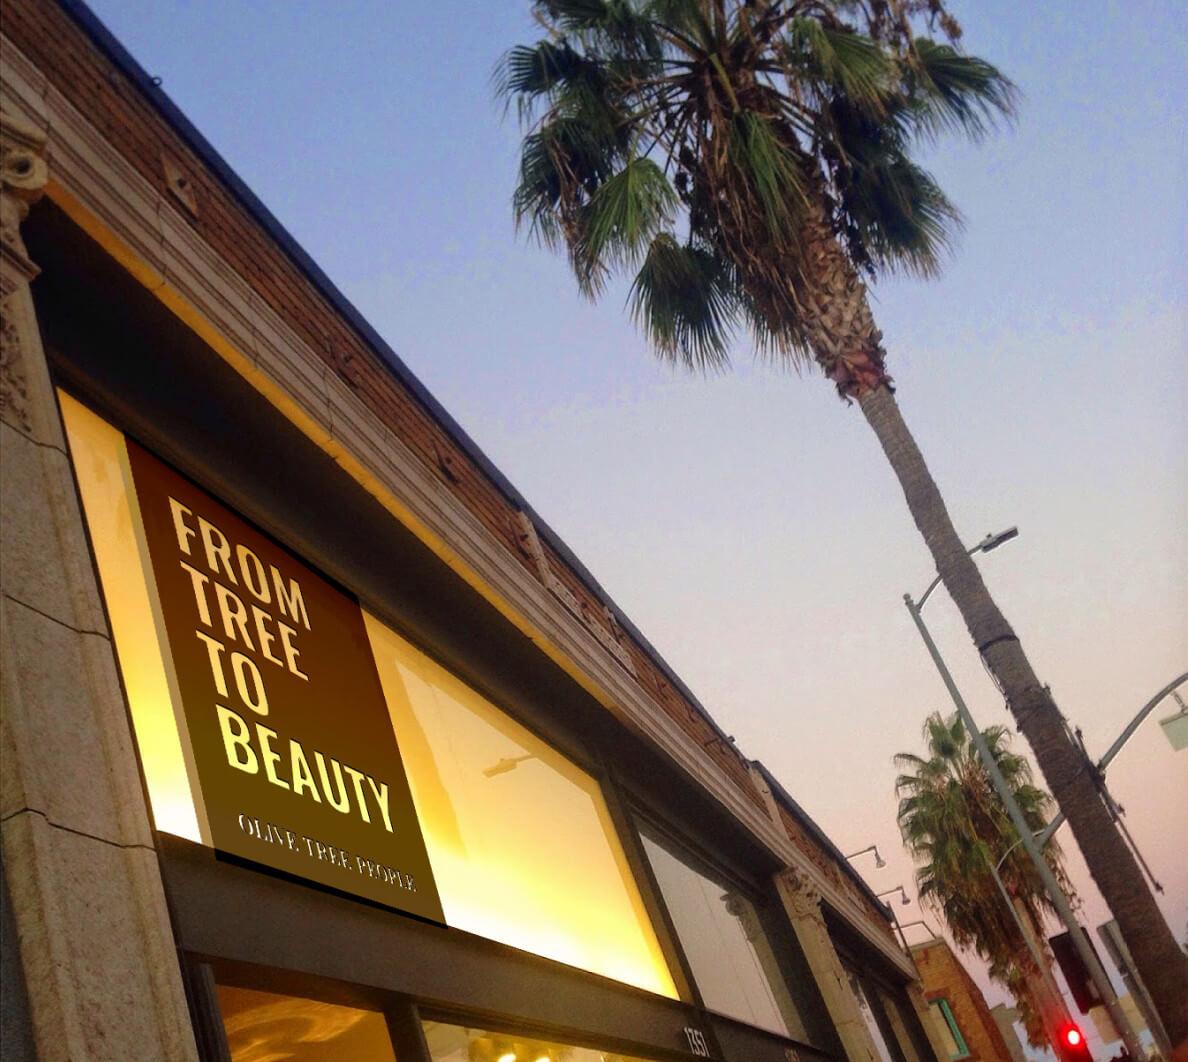 Olive Tree People store in Los Angeles